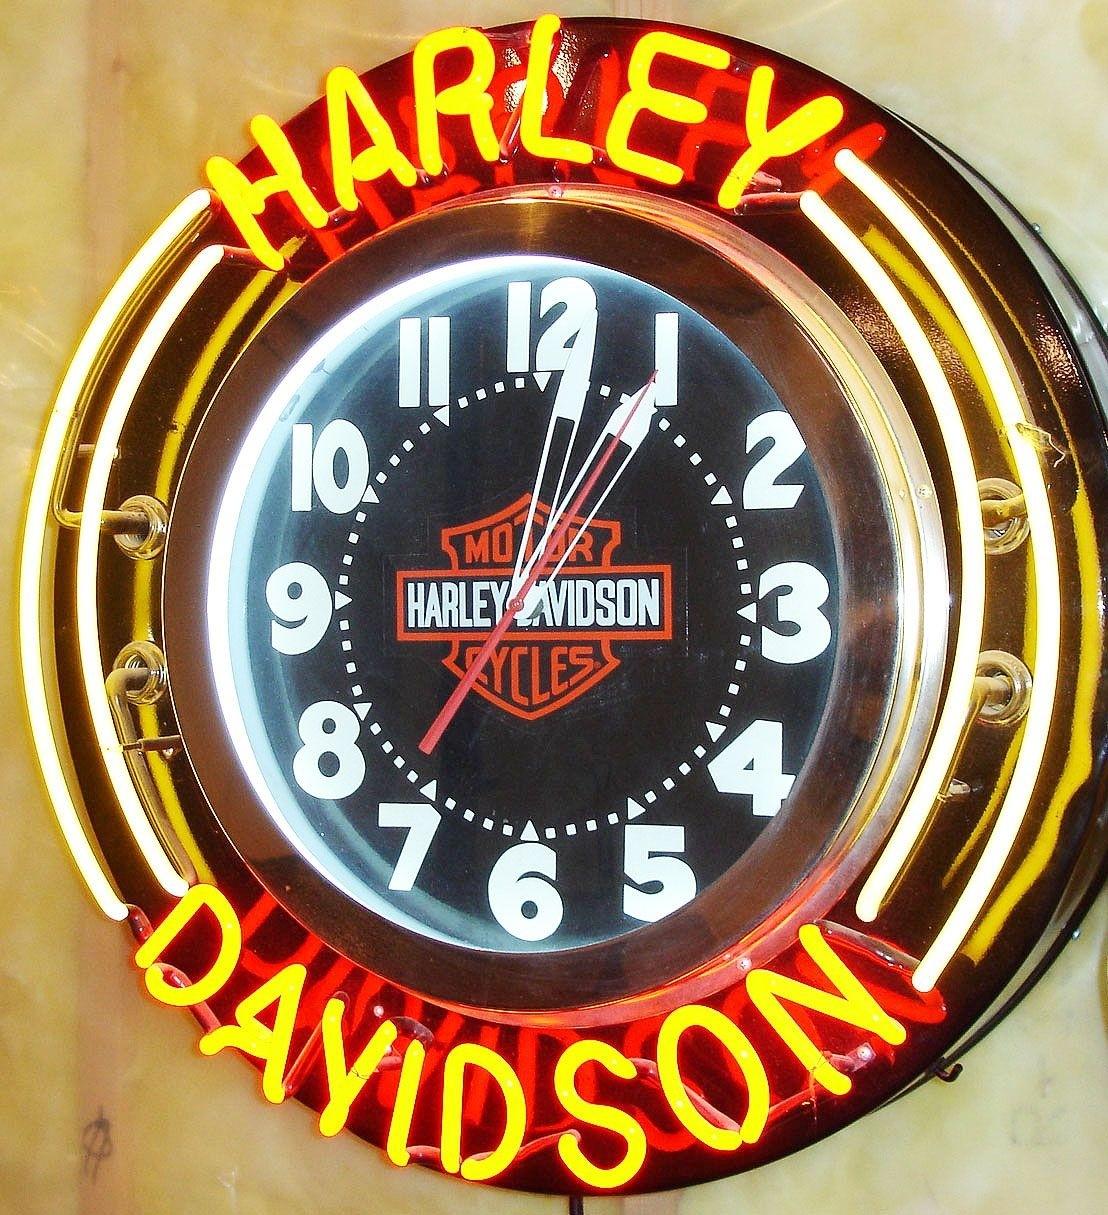 Harley Davidson Vintage Shabby Chic Wooden Sign Old Look Motor Bike American